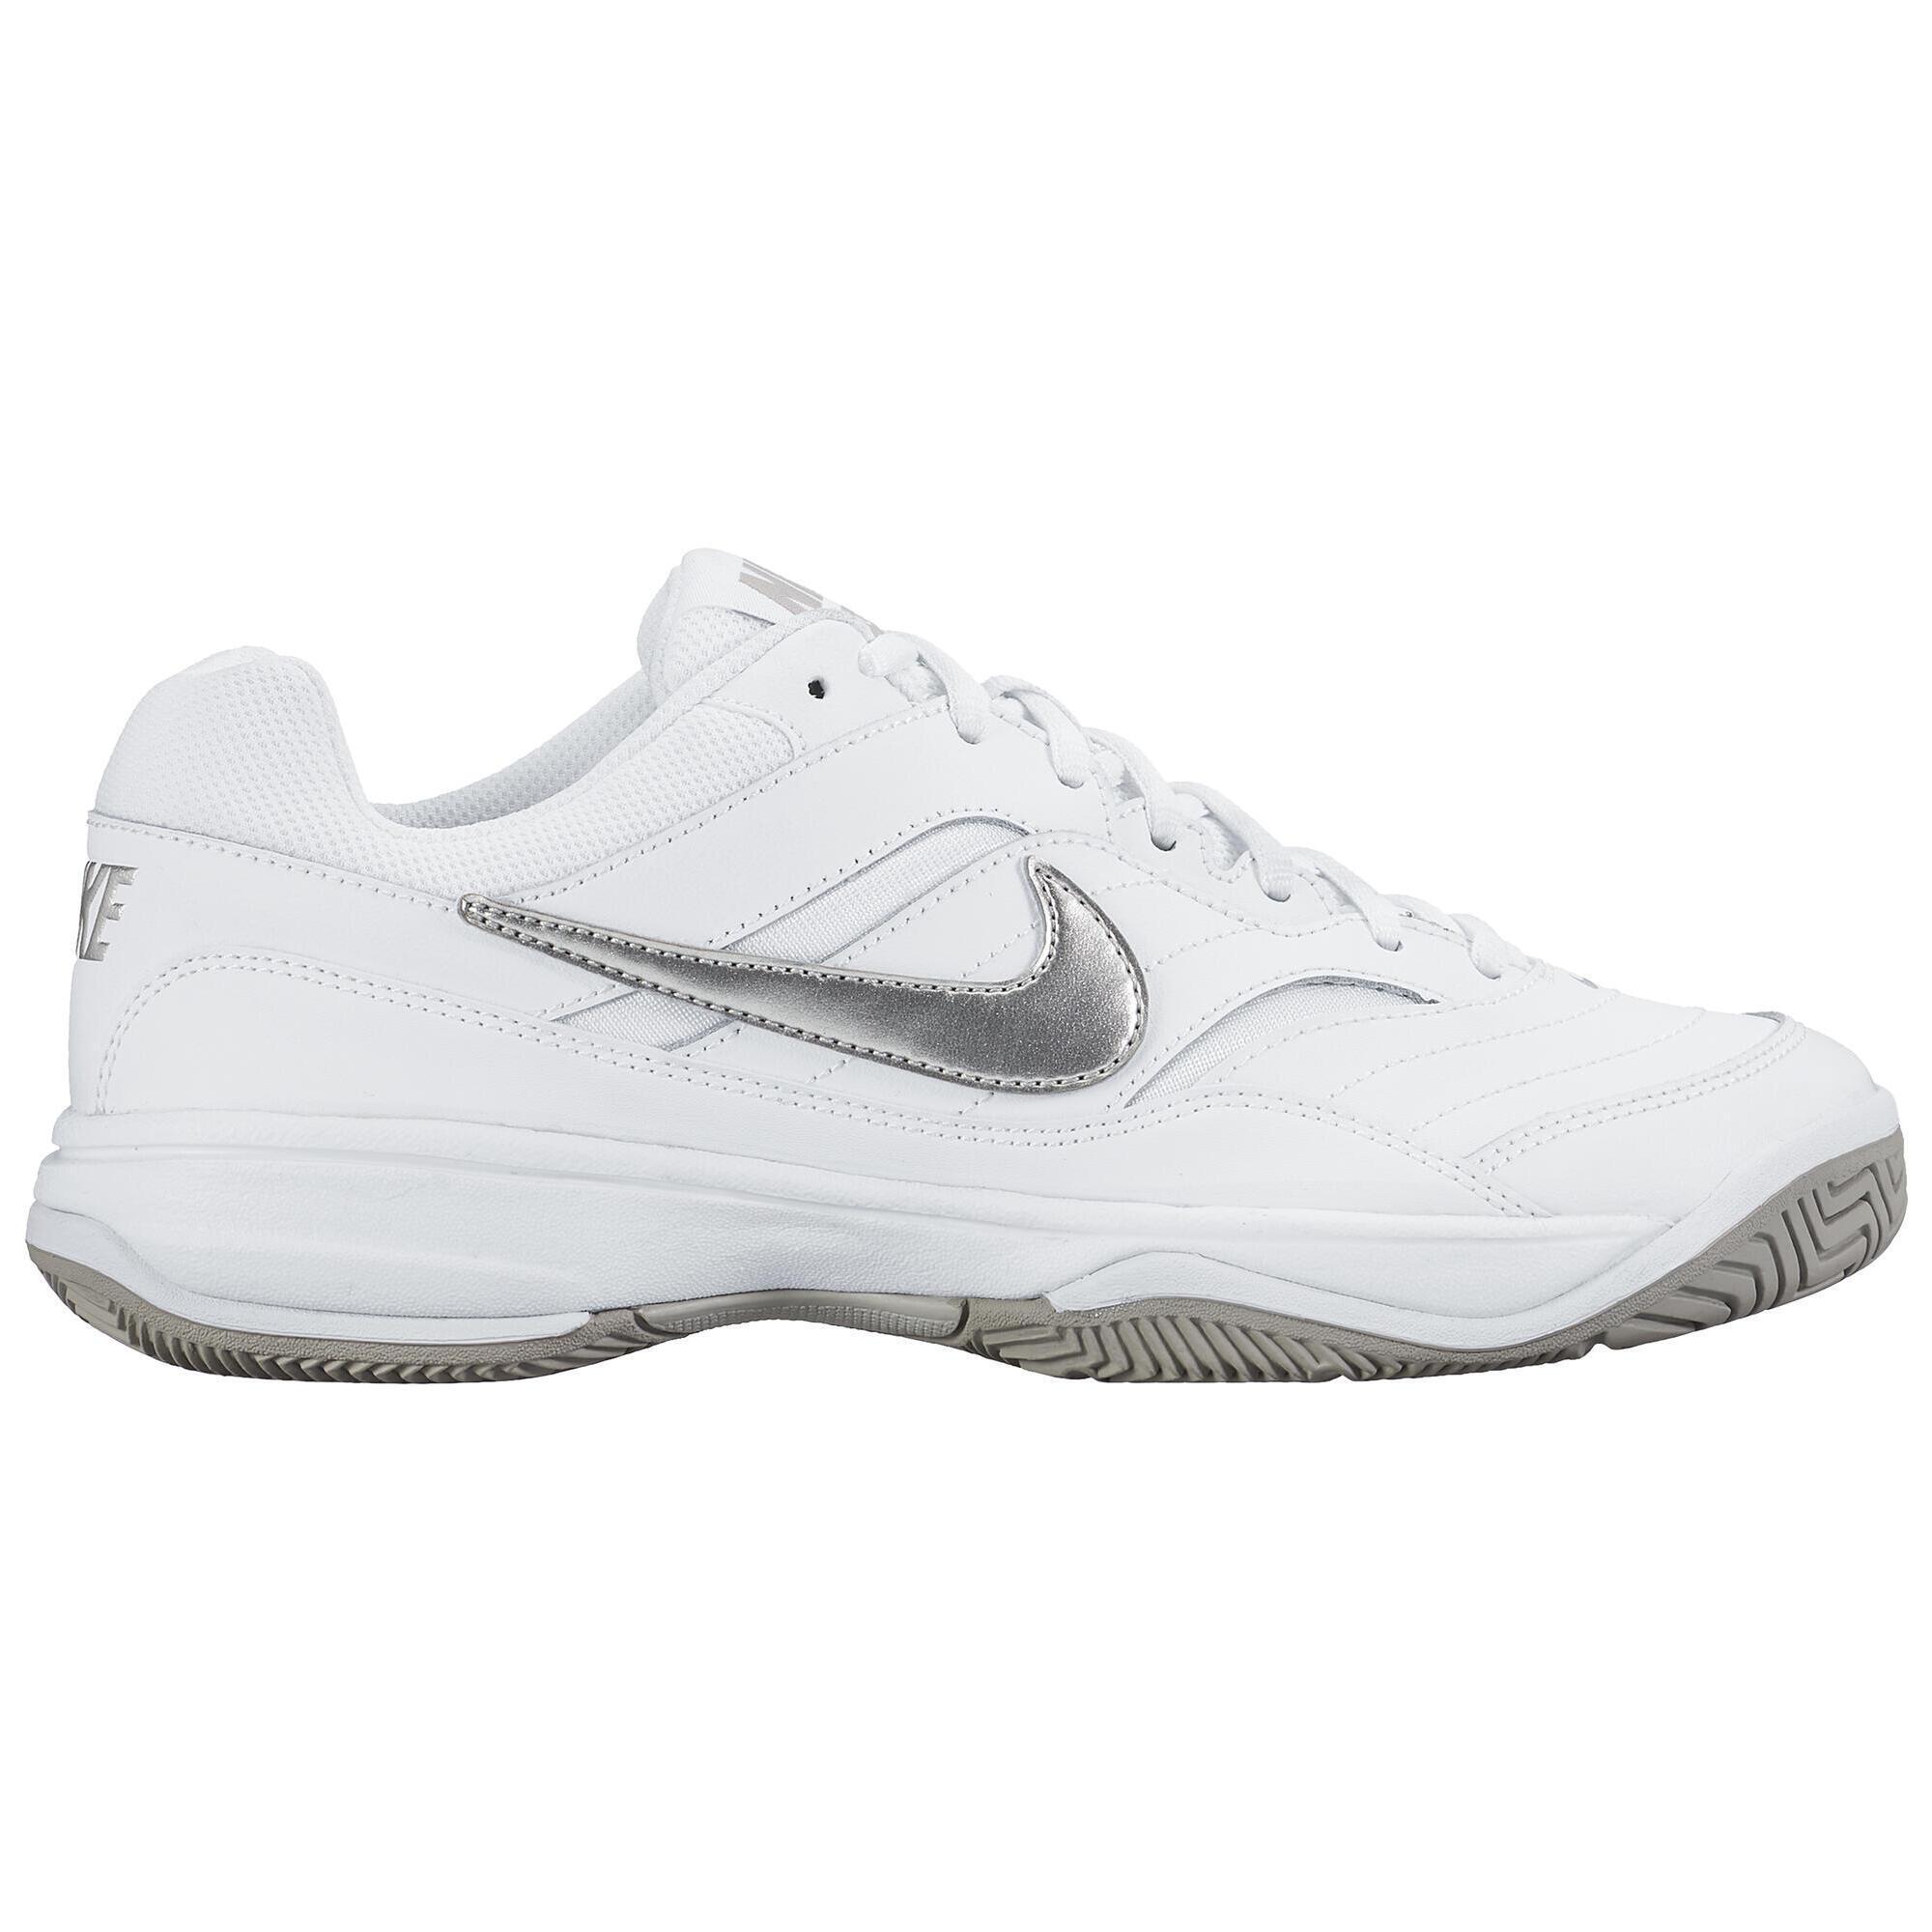 2080825 Nike Tennisschoenen dames Court Lite wit